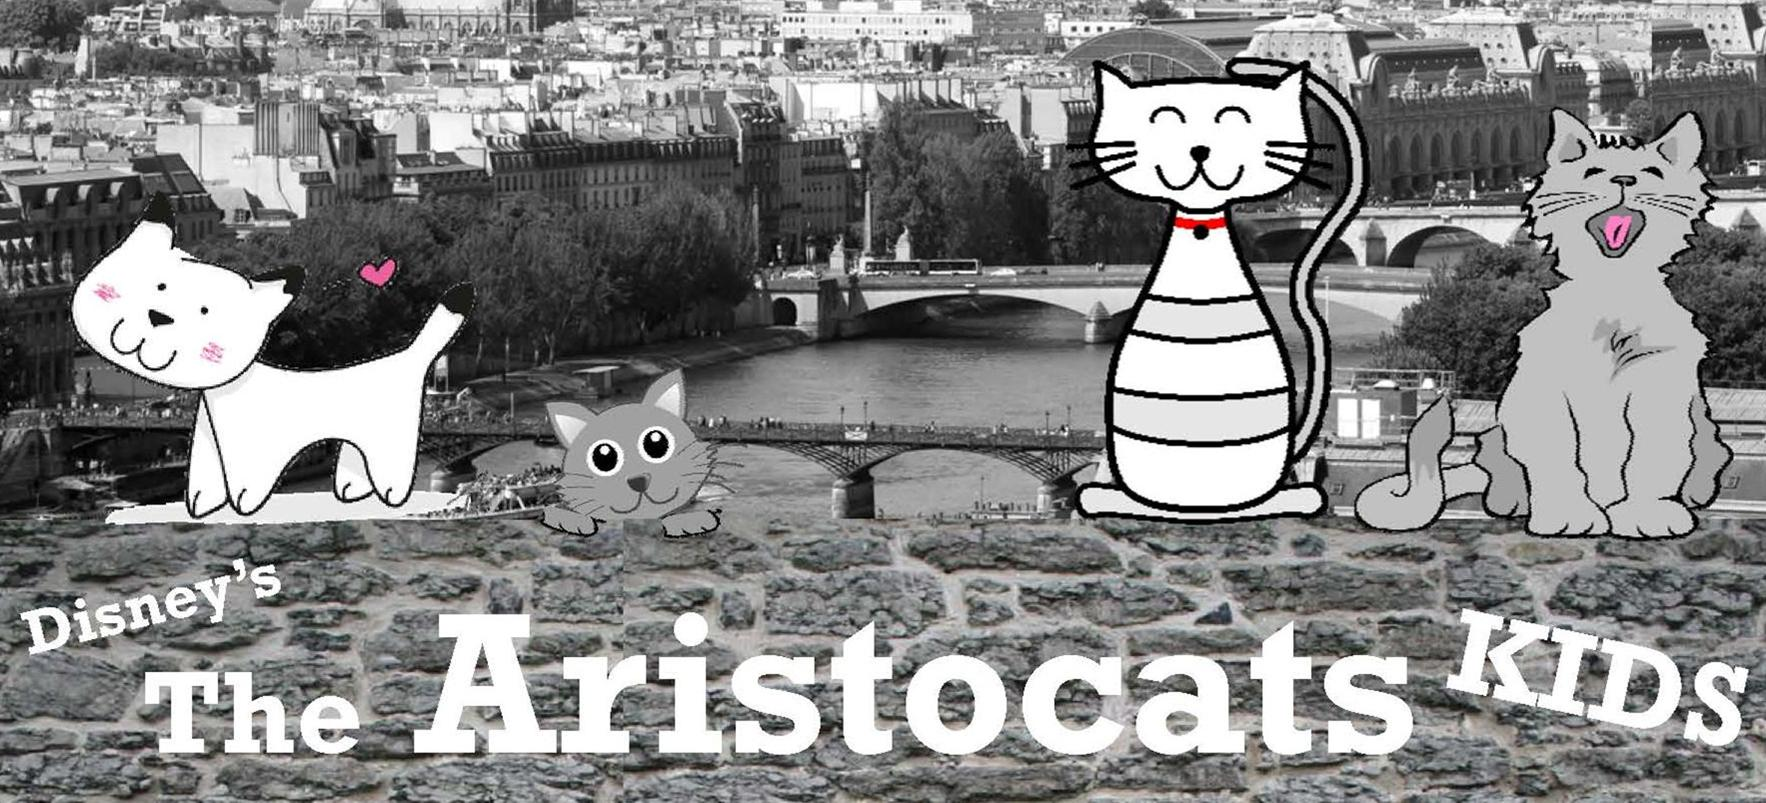 Aristocats Title2